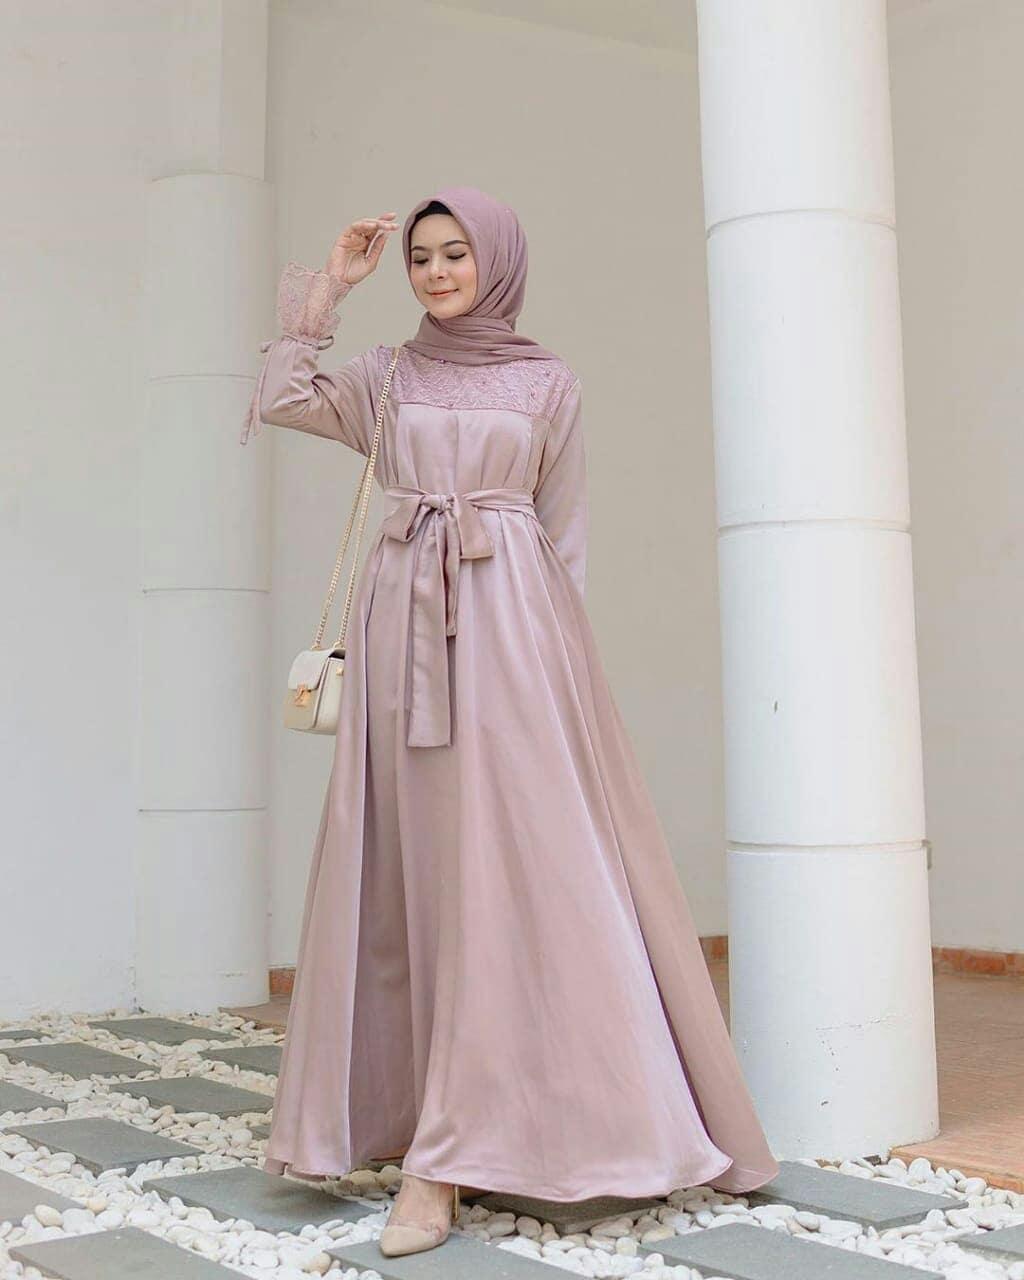 Zhirana Dress Gaun Pesta Baju Muslim Modern Dress Muslim Terbaru Baju Gamis Kebaya Brukat Baju Muslim Terbaru Kebaya Kondangan Baju Murah Gamis Modern